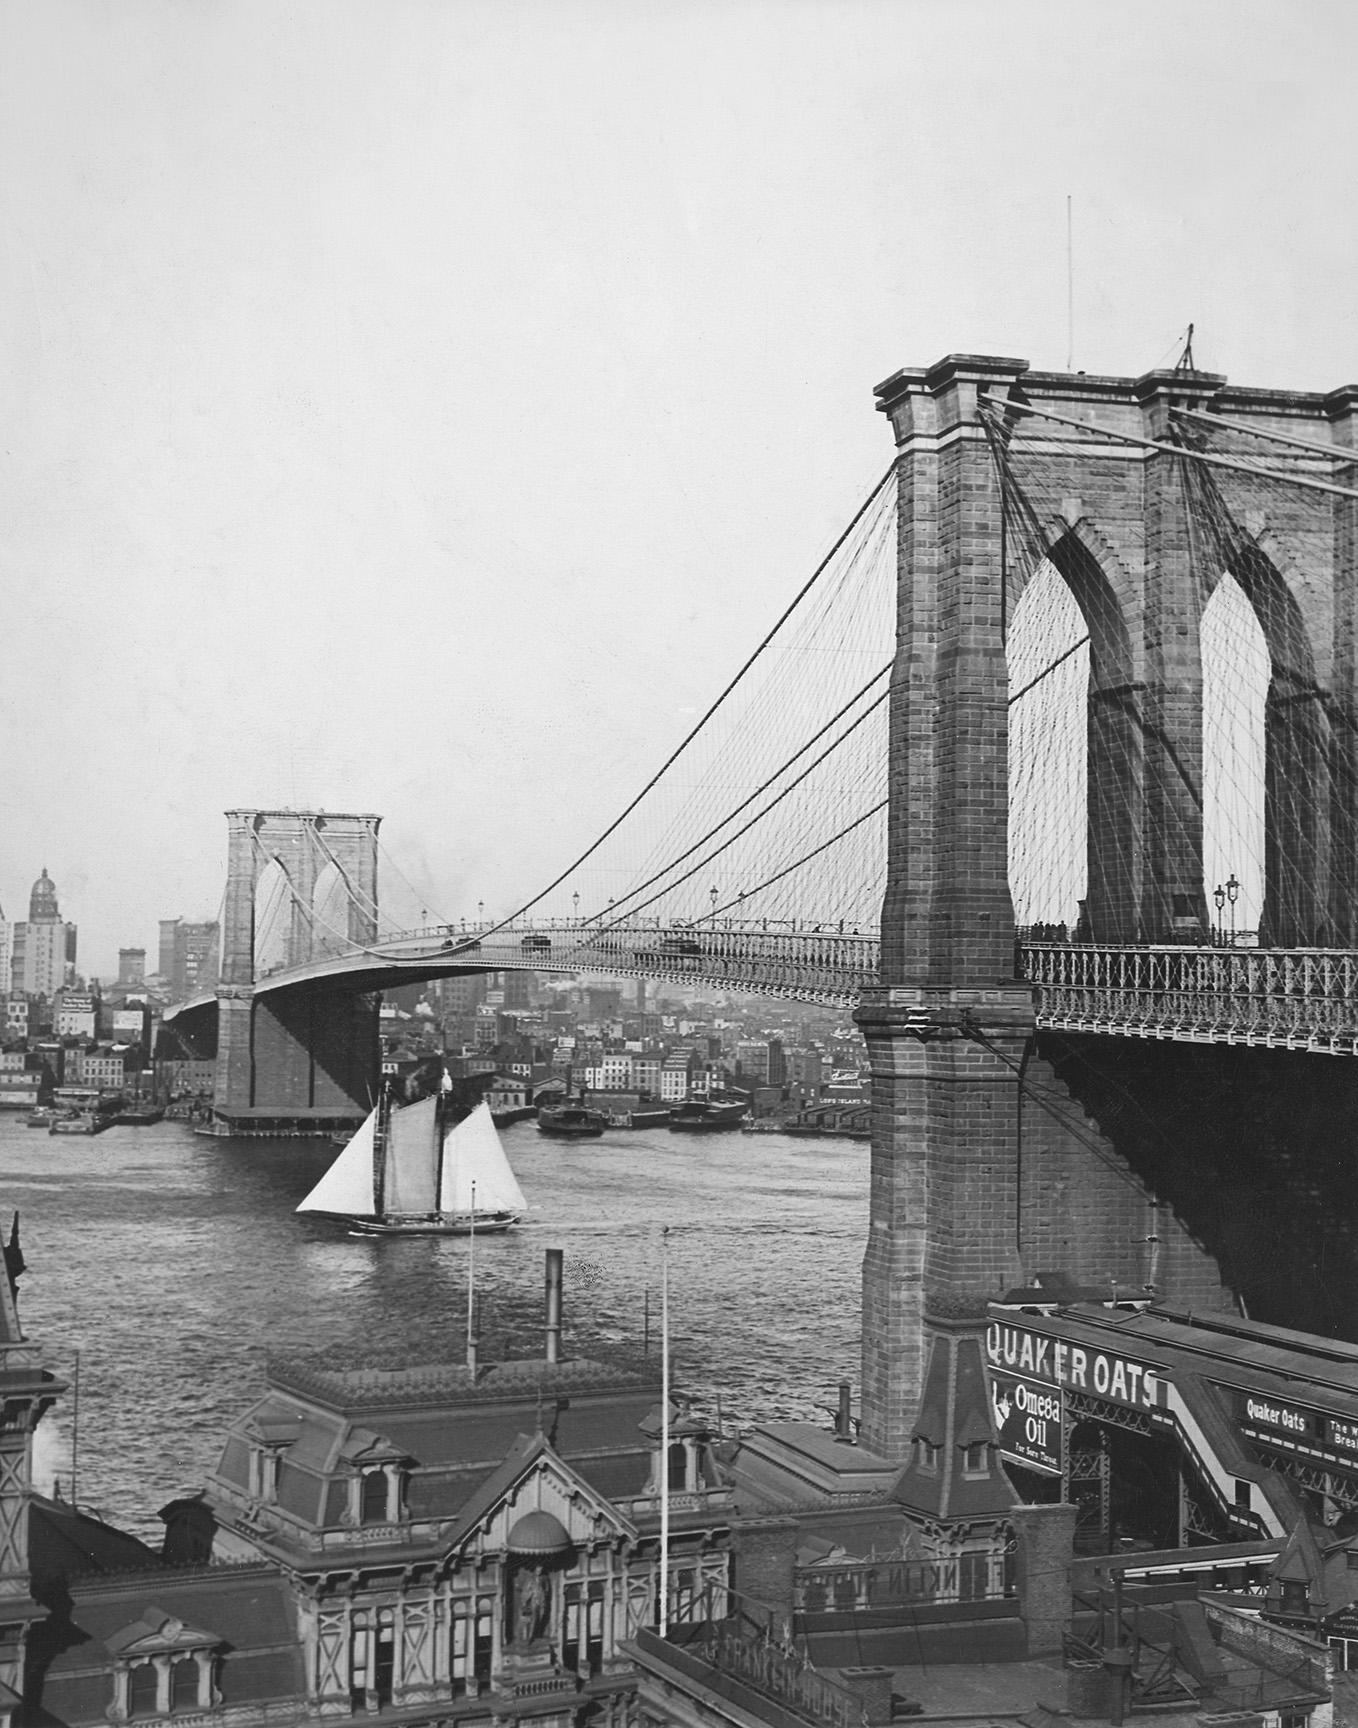 Brooklyn Bridge, Underwood & Underwood, ca. 1900